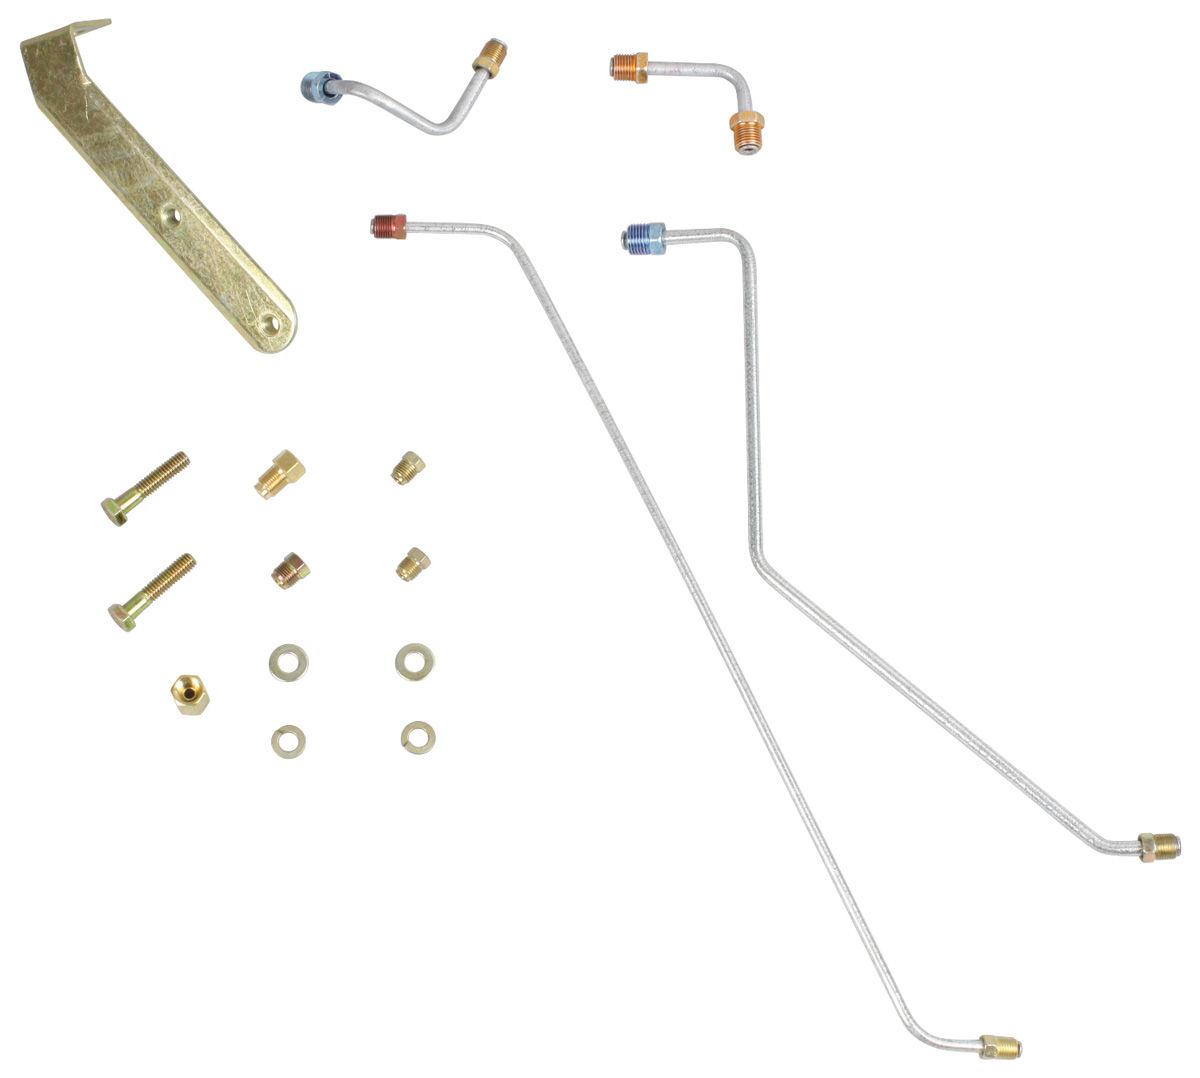 1999 Ford Ranger Fuel Pump Relay Location moreover 332 Rear Pto Wiring Diagram additionally 89 Mazda B2200 Parts Diagram also 1964 Et Wiring Diagram besides Mercury Ignition Switch Wiring Diagram. on 1965 mercury et wiring diagram